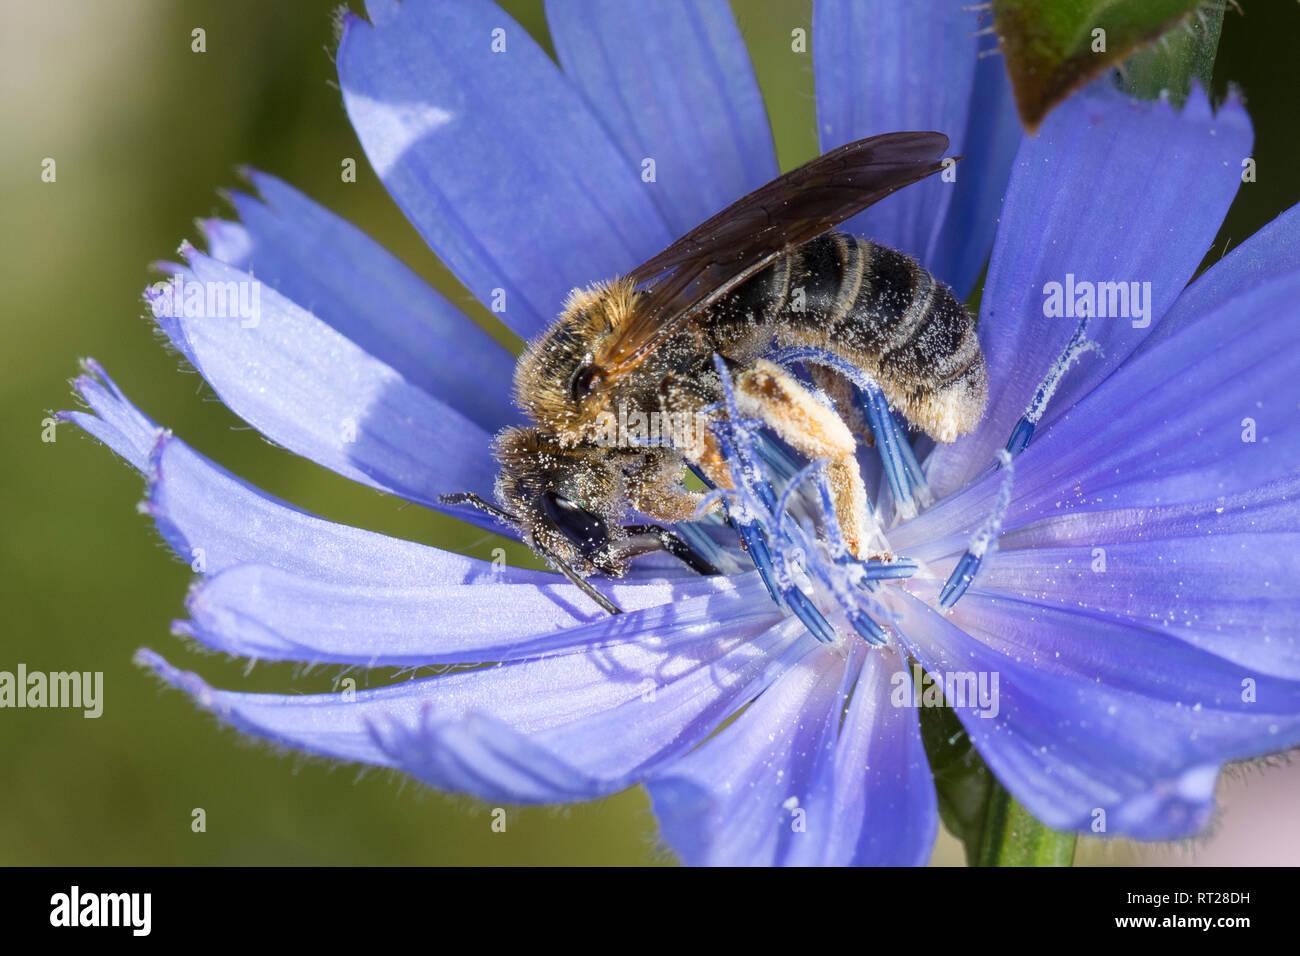 Sechsbindige Furchenbiene, Weißbindige Furchenbiene, Furchenbiene, Blütenbesuch an Wegwarte, Halictus cf. sexcinctus, six-banded furrow bee, Furchenbi - Stock Image